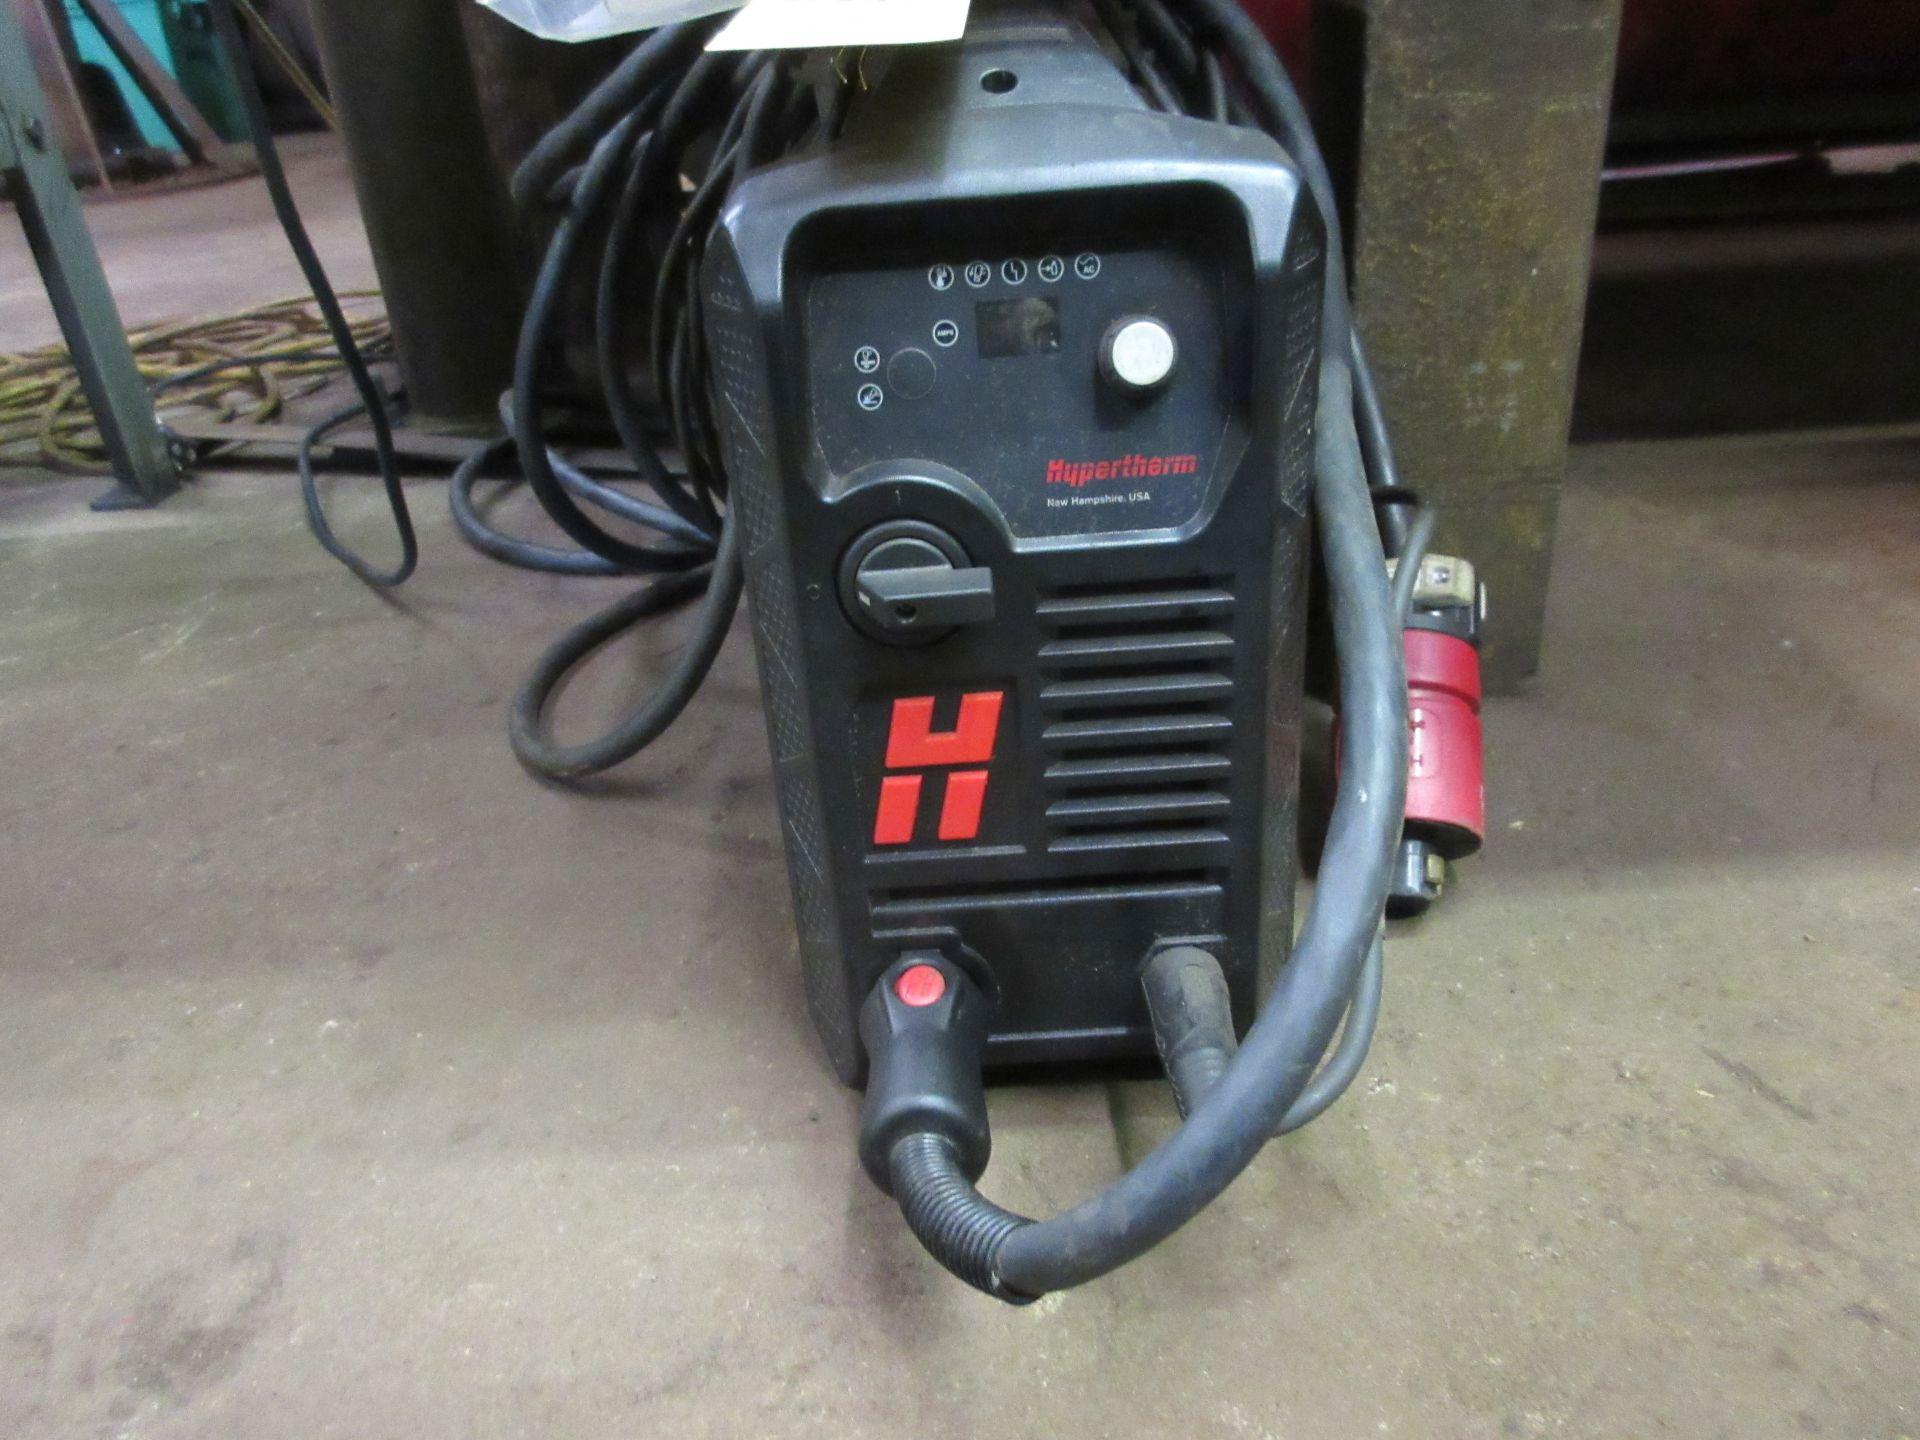 (1) Hypertherm Powermax 45XP Plasma Cutter - Image 2 of 2